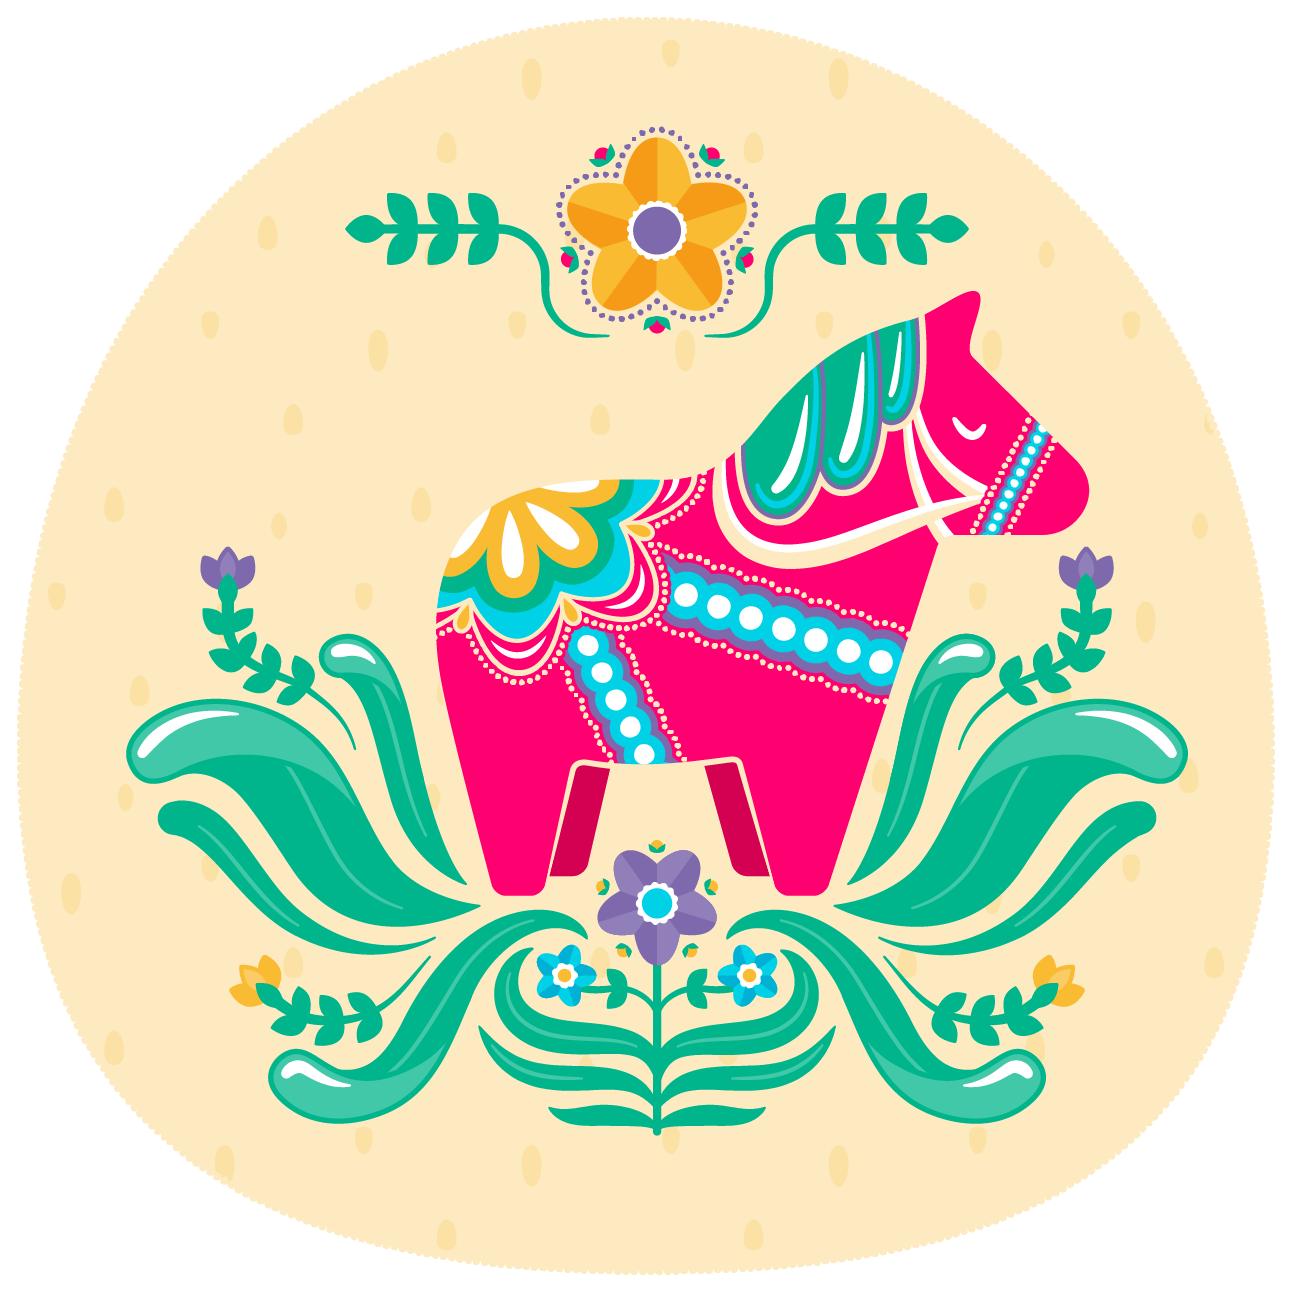 dalahorse